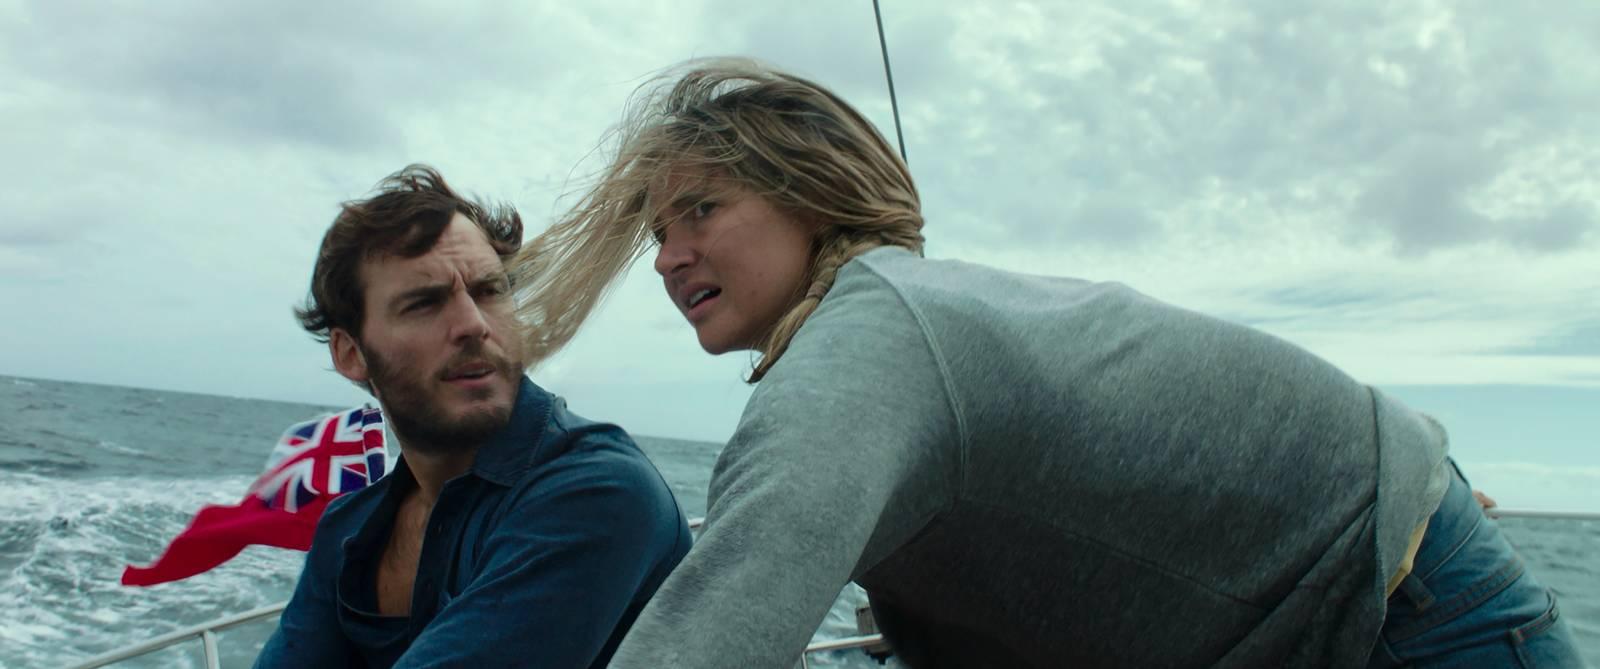 Film Kým prišla búrka (2018)